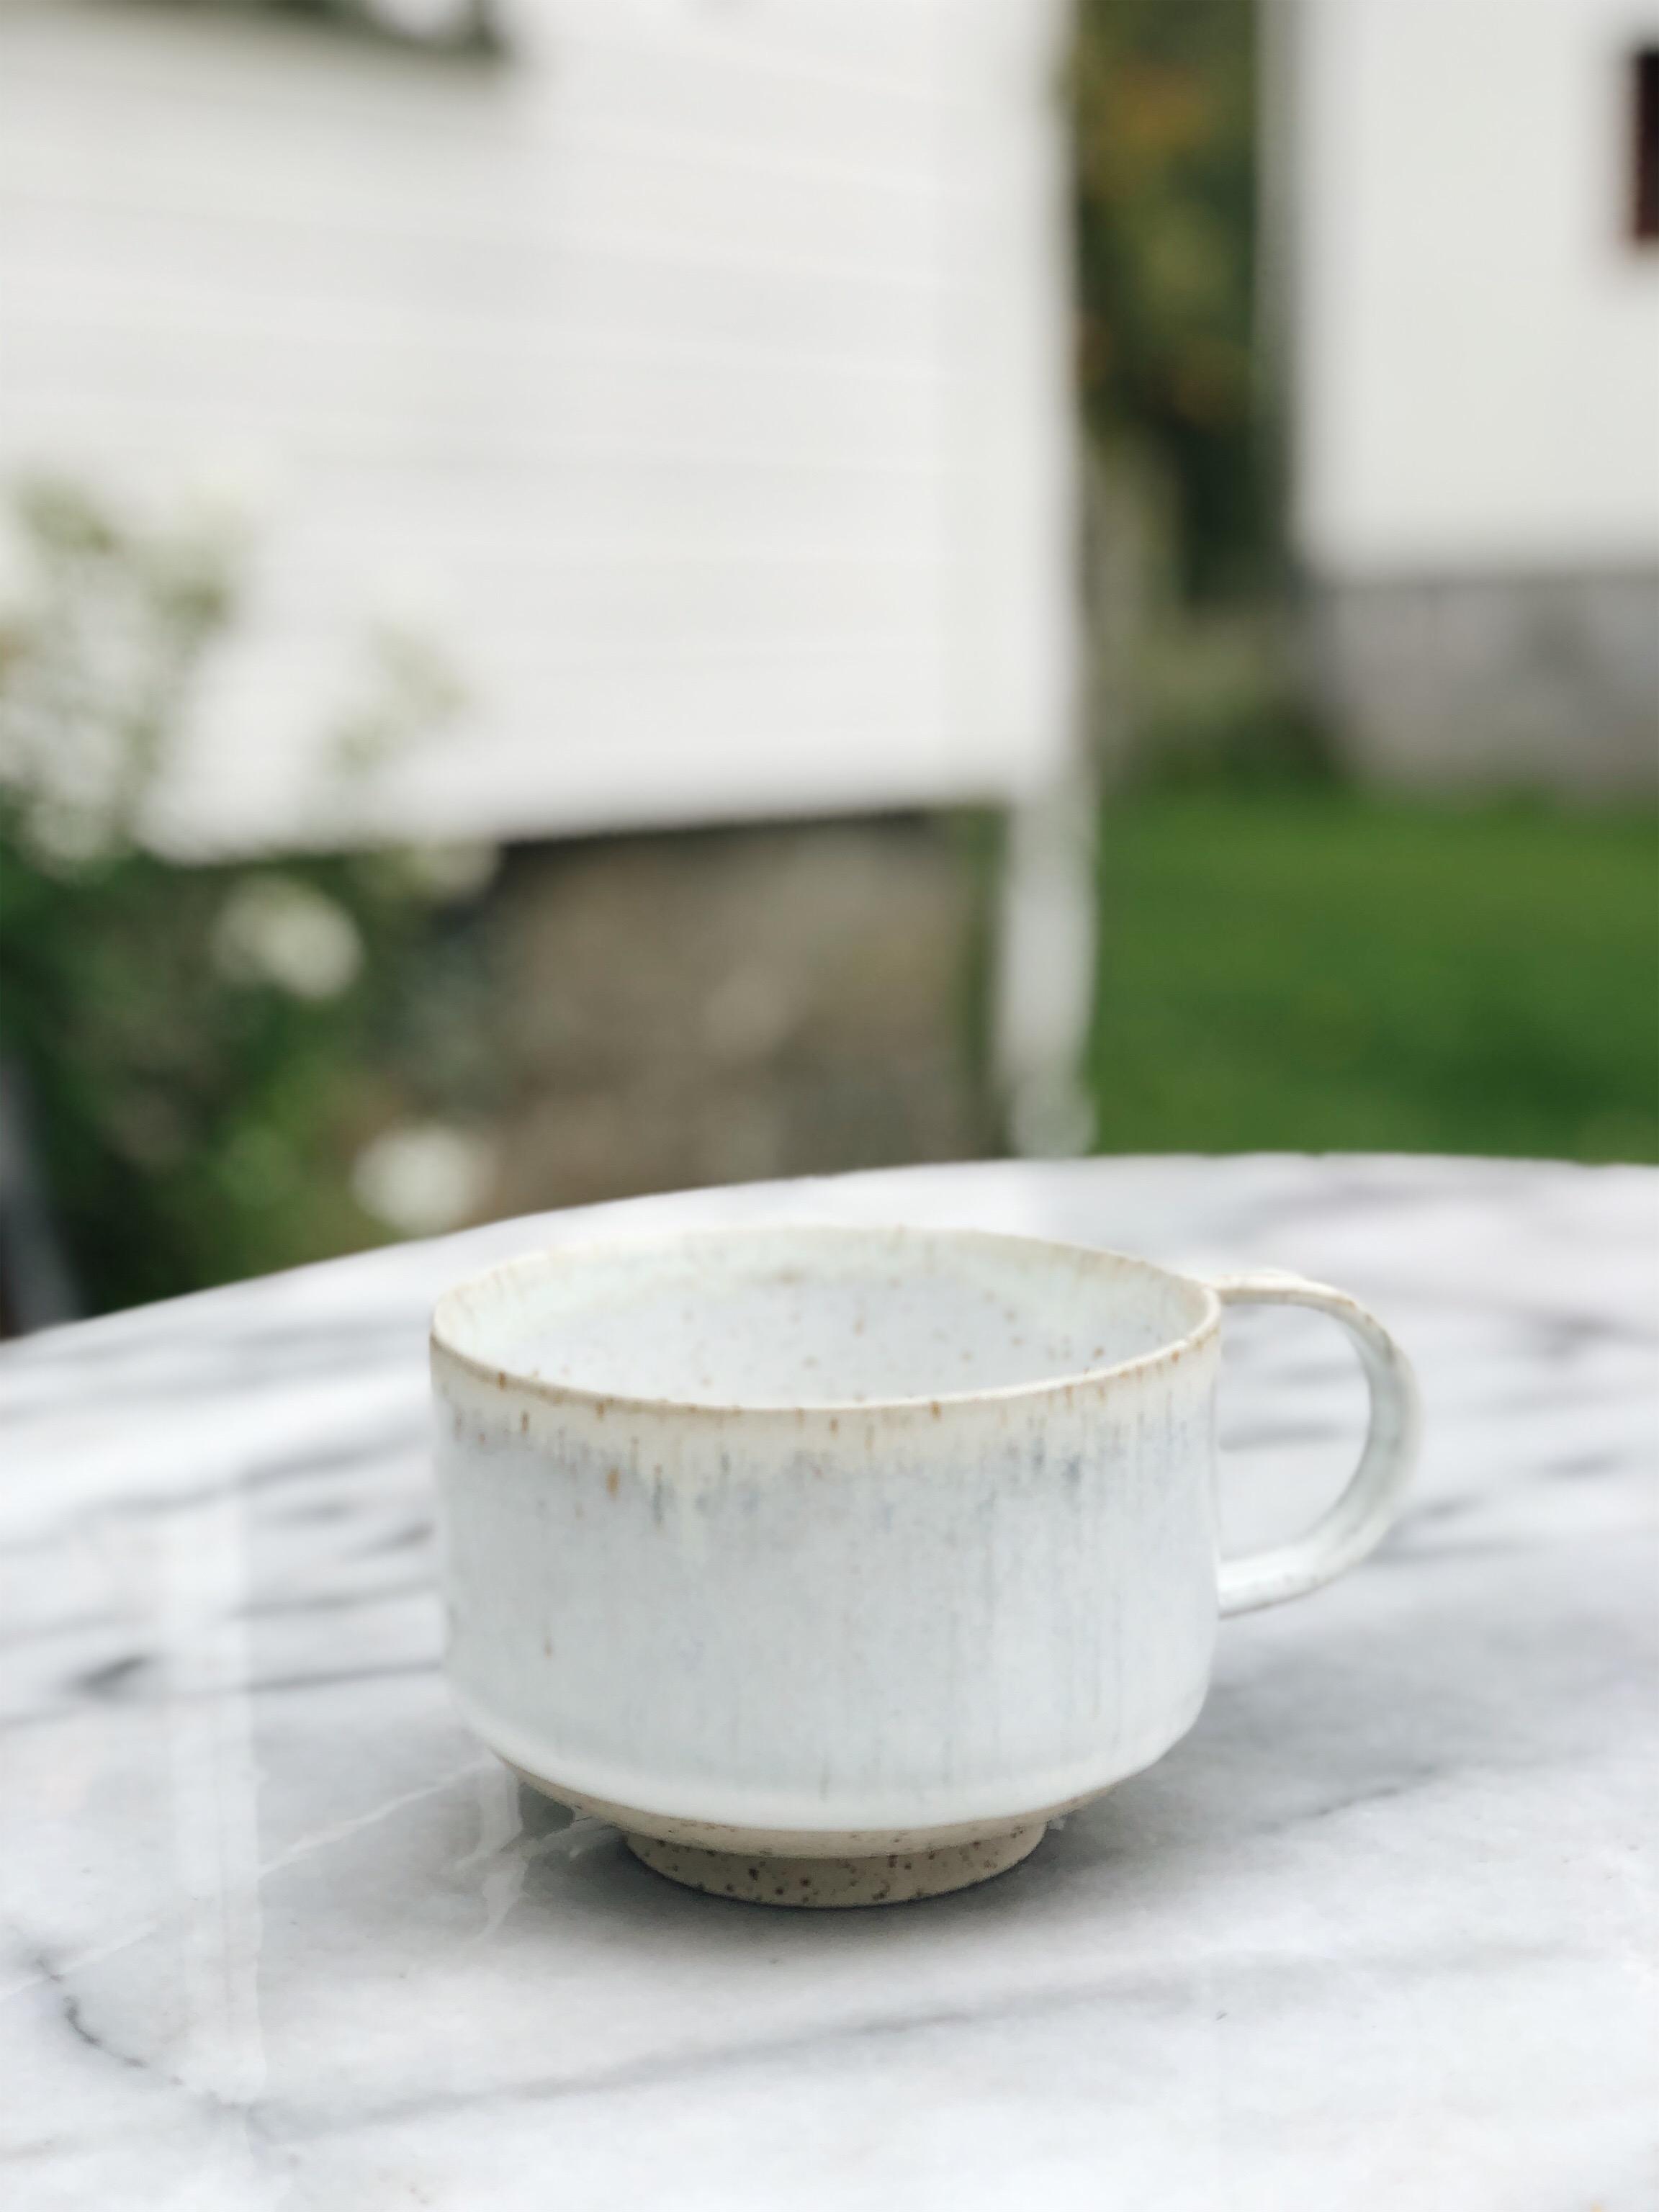 STUDIO ARHØJ - Mion Mug, White Llama